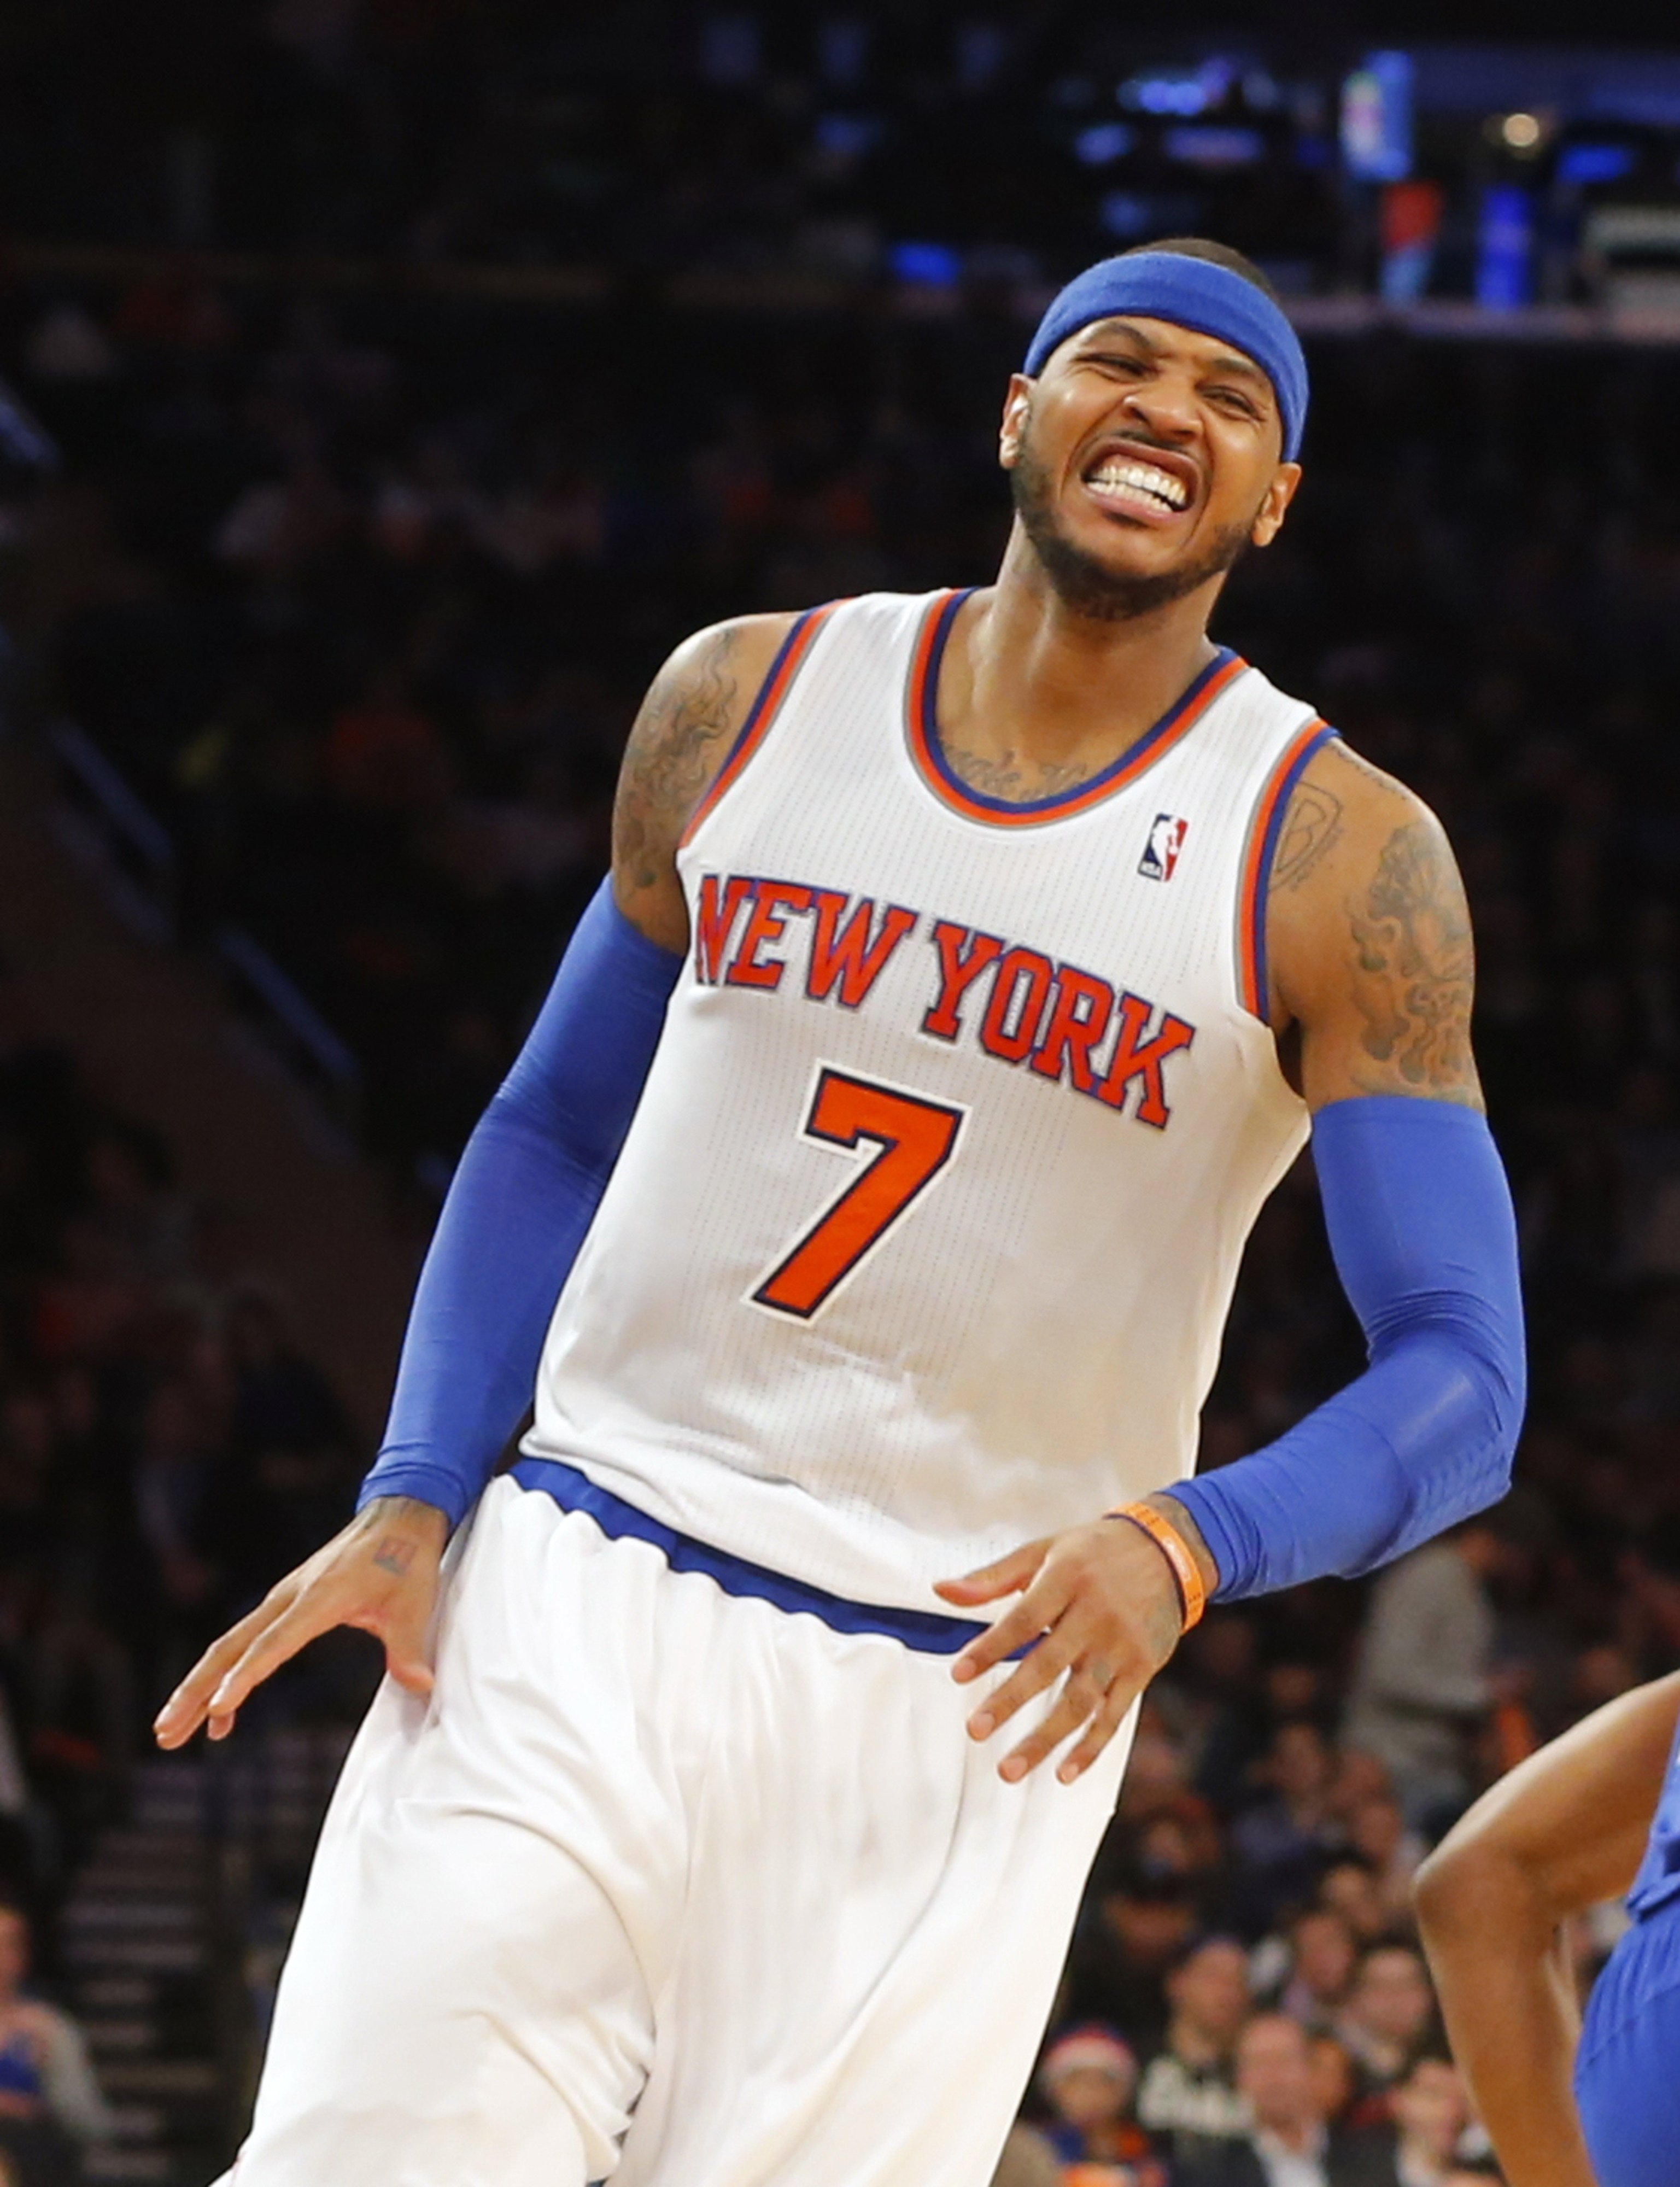 Carmelo Anthony's 62 points breaks Knicks, MSG records